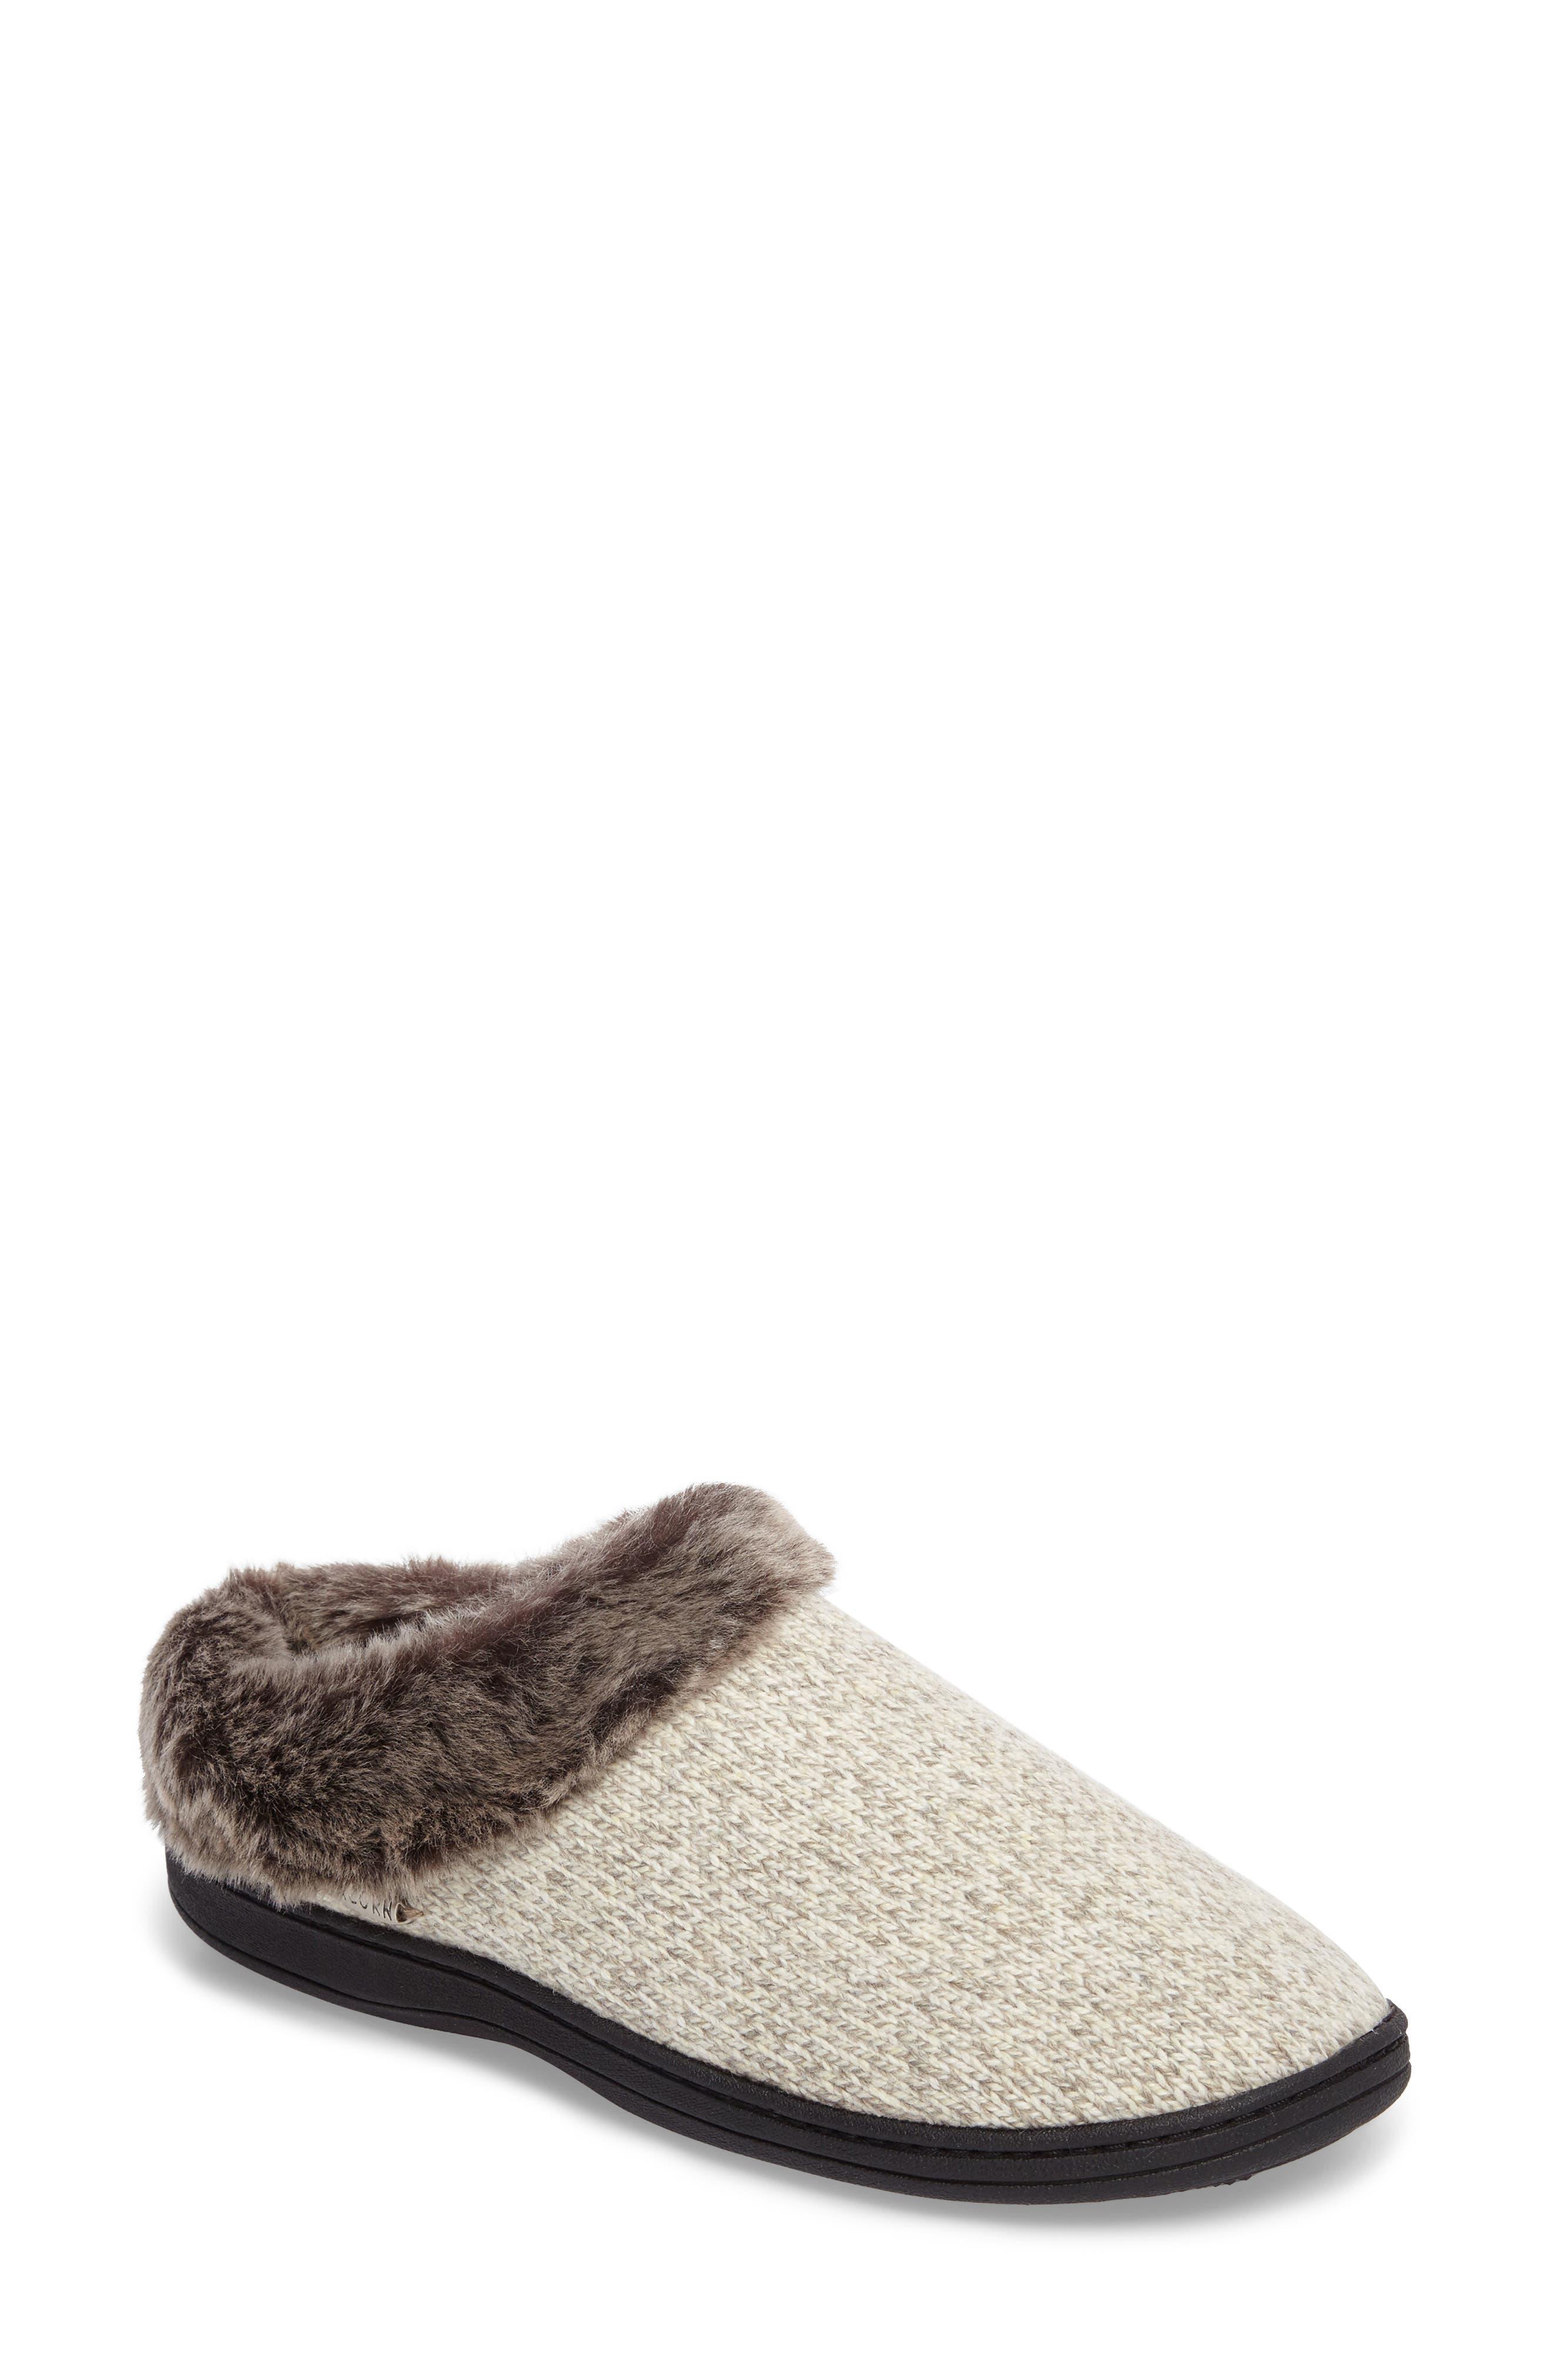 ACORN Chinchilla Faux Fur Slipper, Charcoal Heather